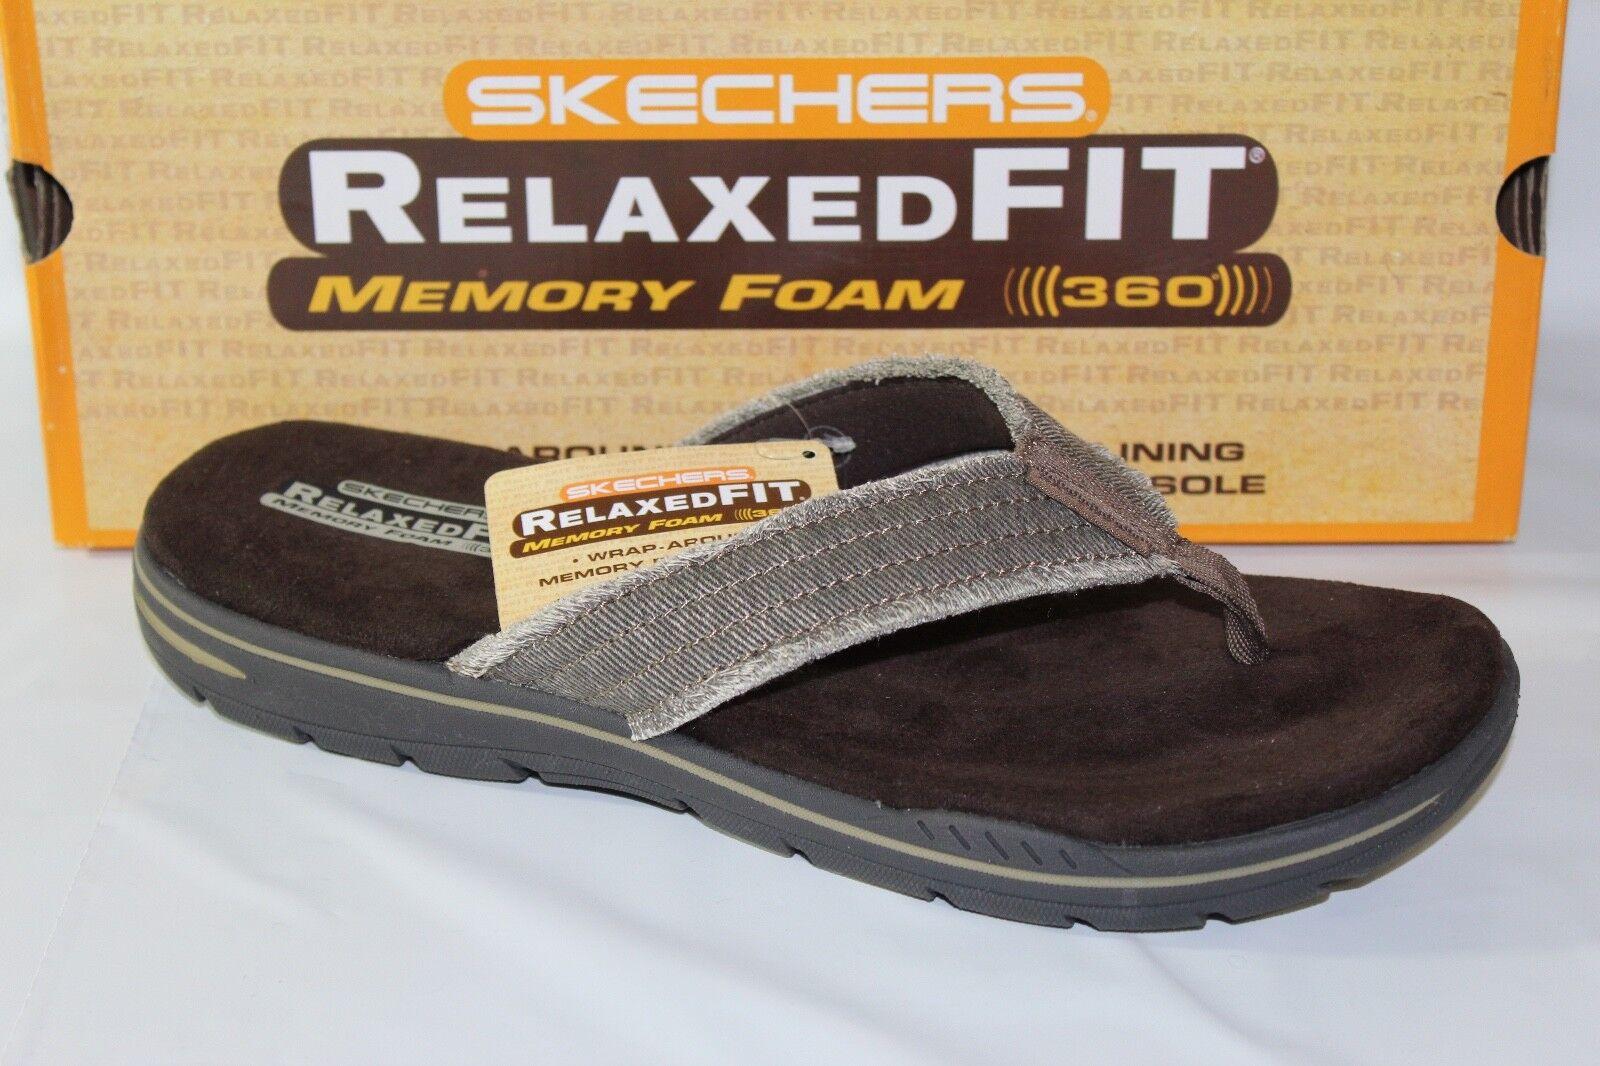 Arven Flip Flops Mens Toe Post Sandals 65091 Evented Skechers Relaxed Fit